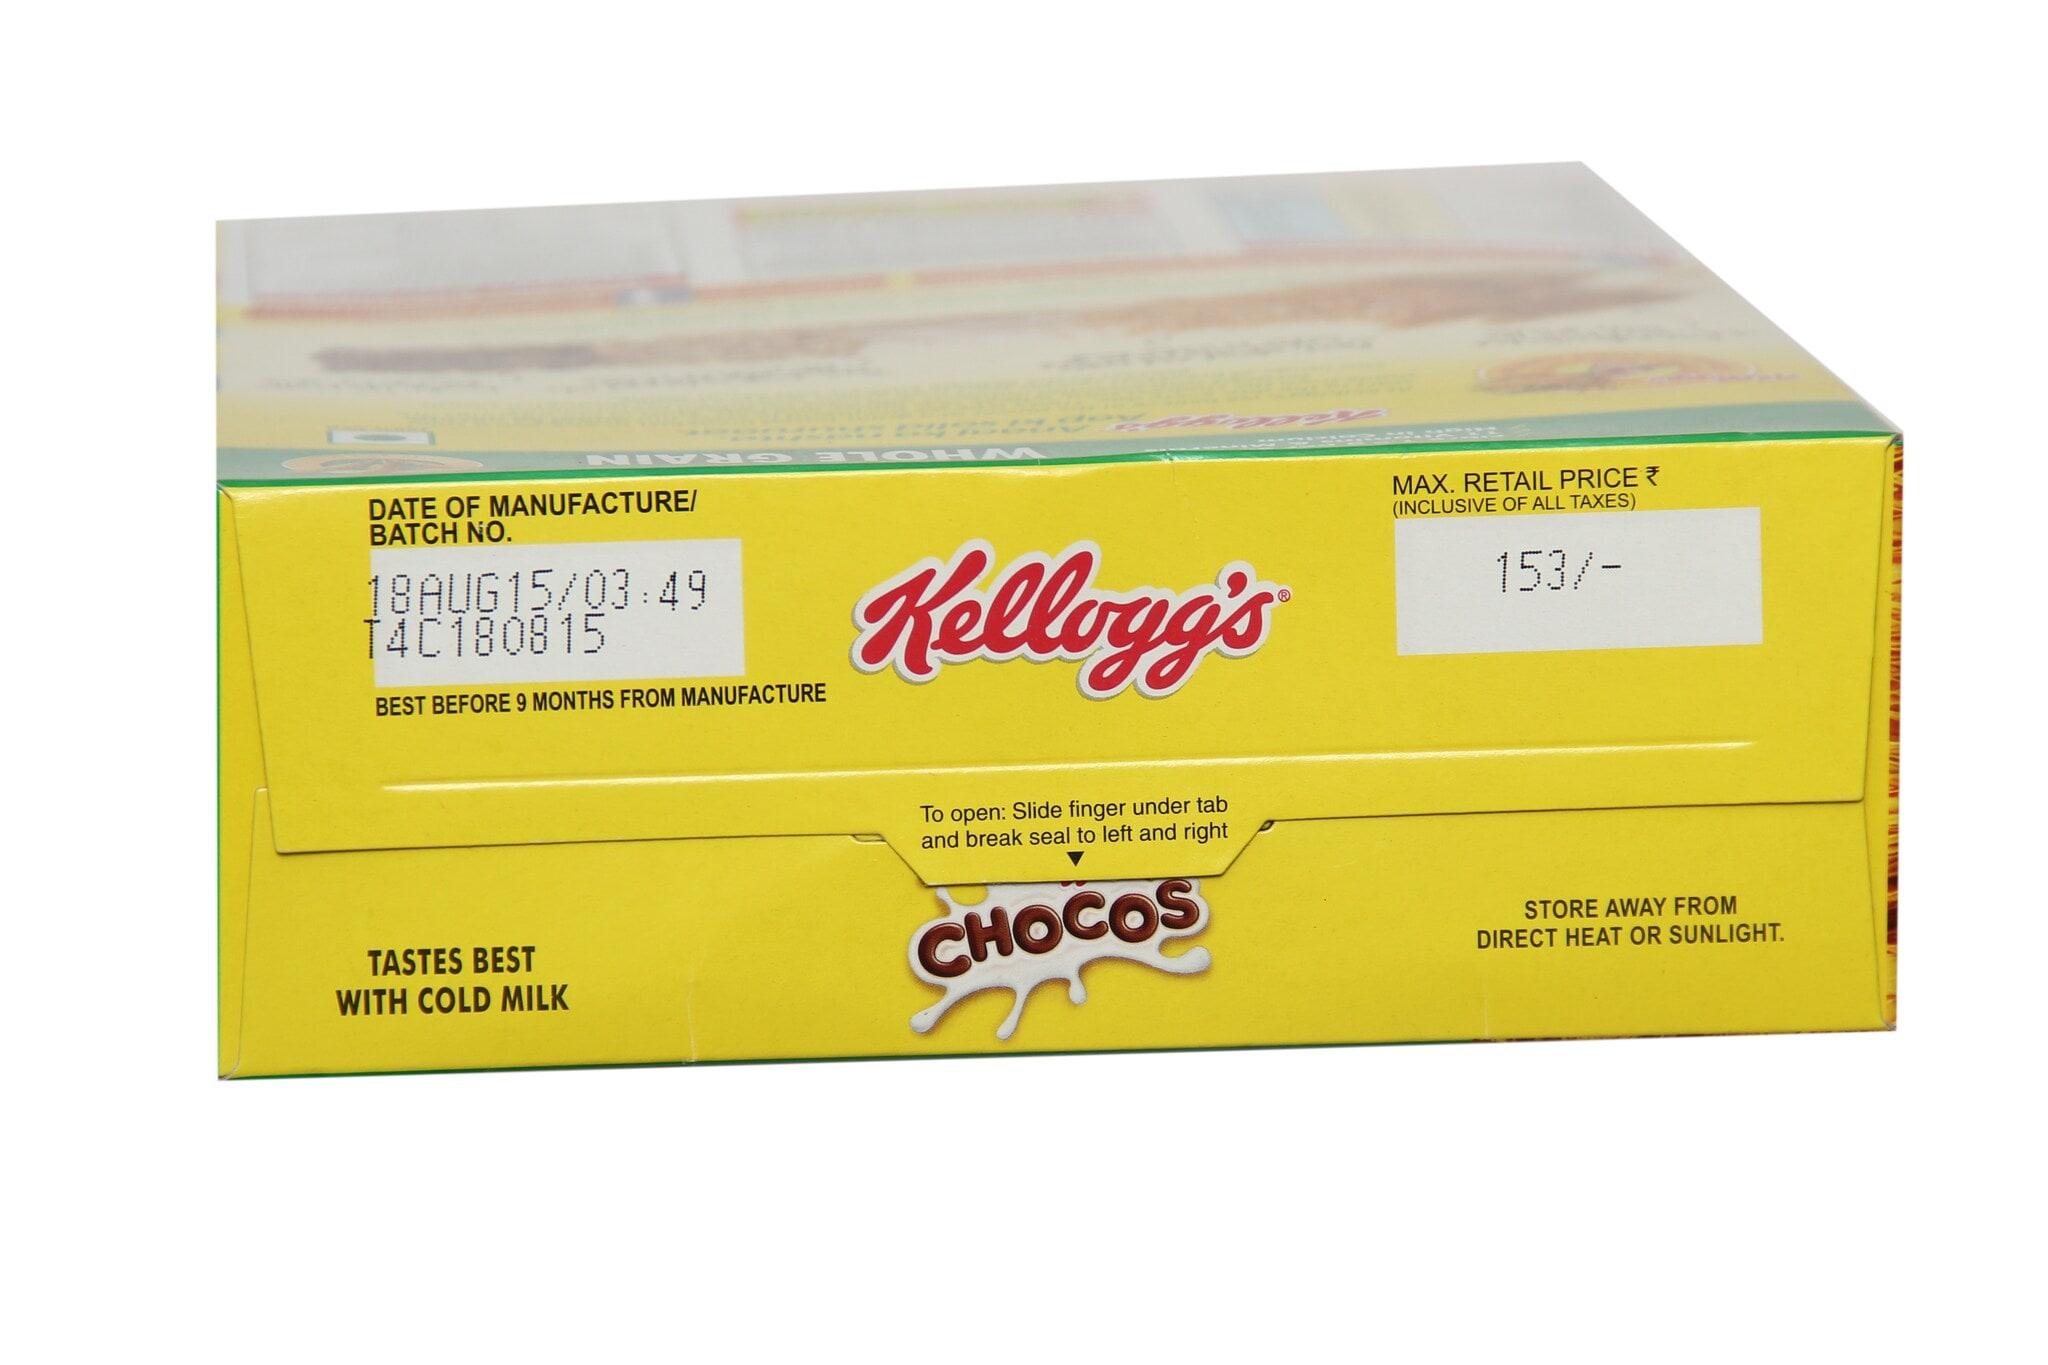 Kellogg's Chocos Whole Grain 375 Gm